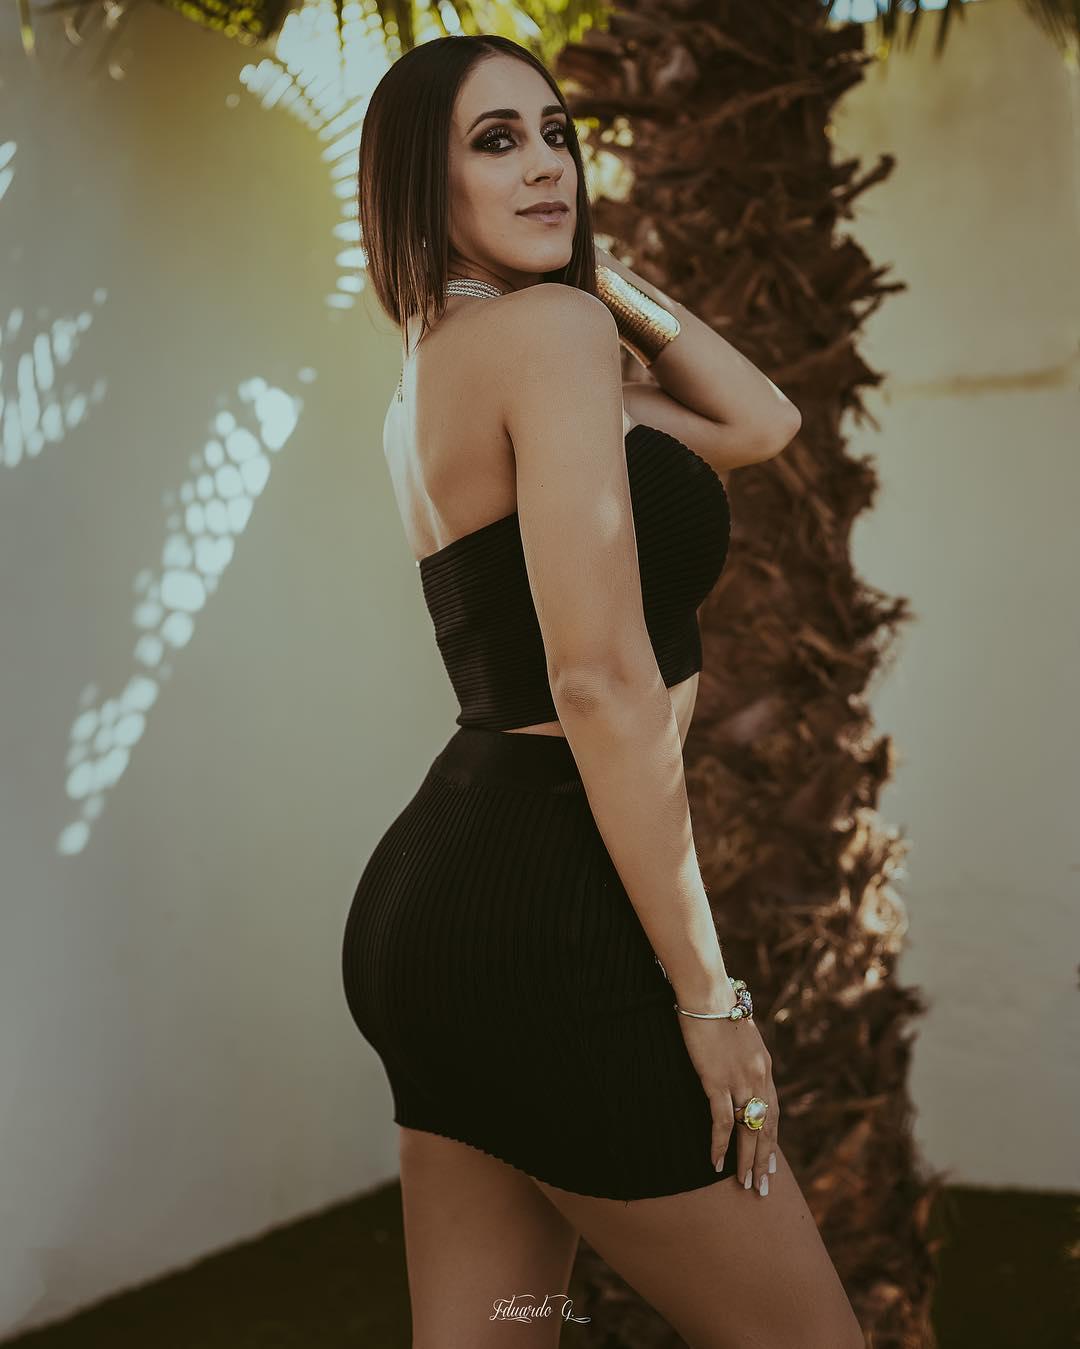 melissa danda, miss eco mexico 2019. 53010813